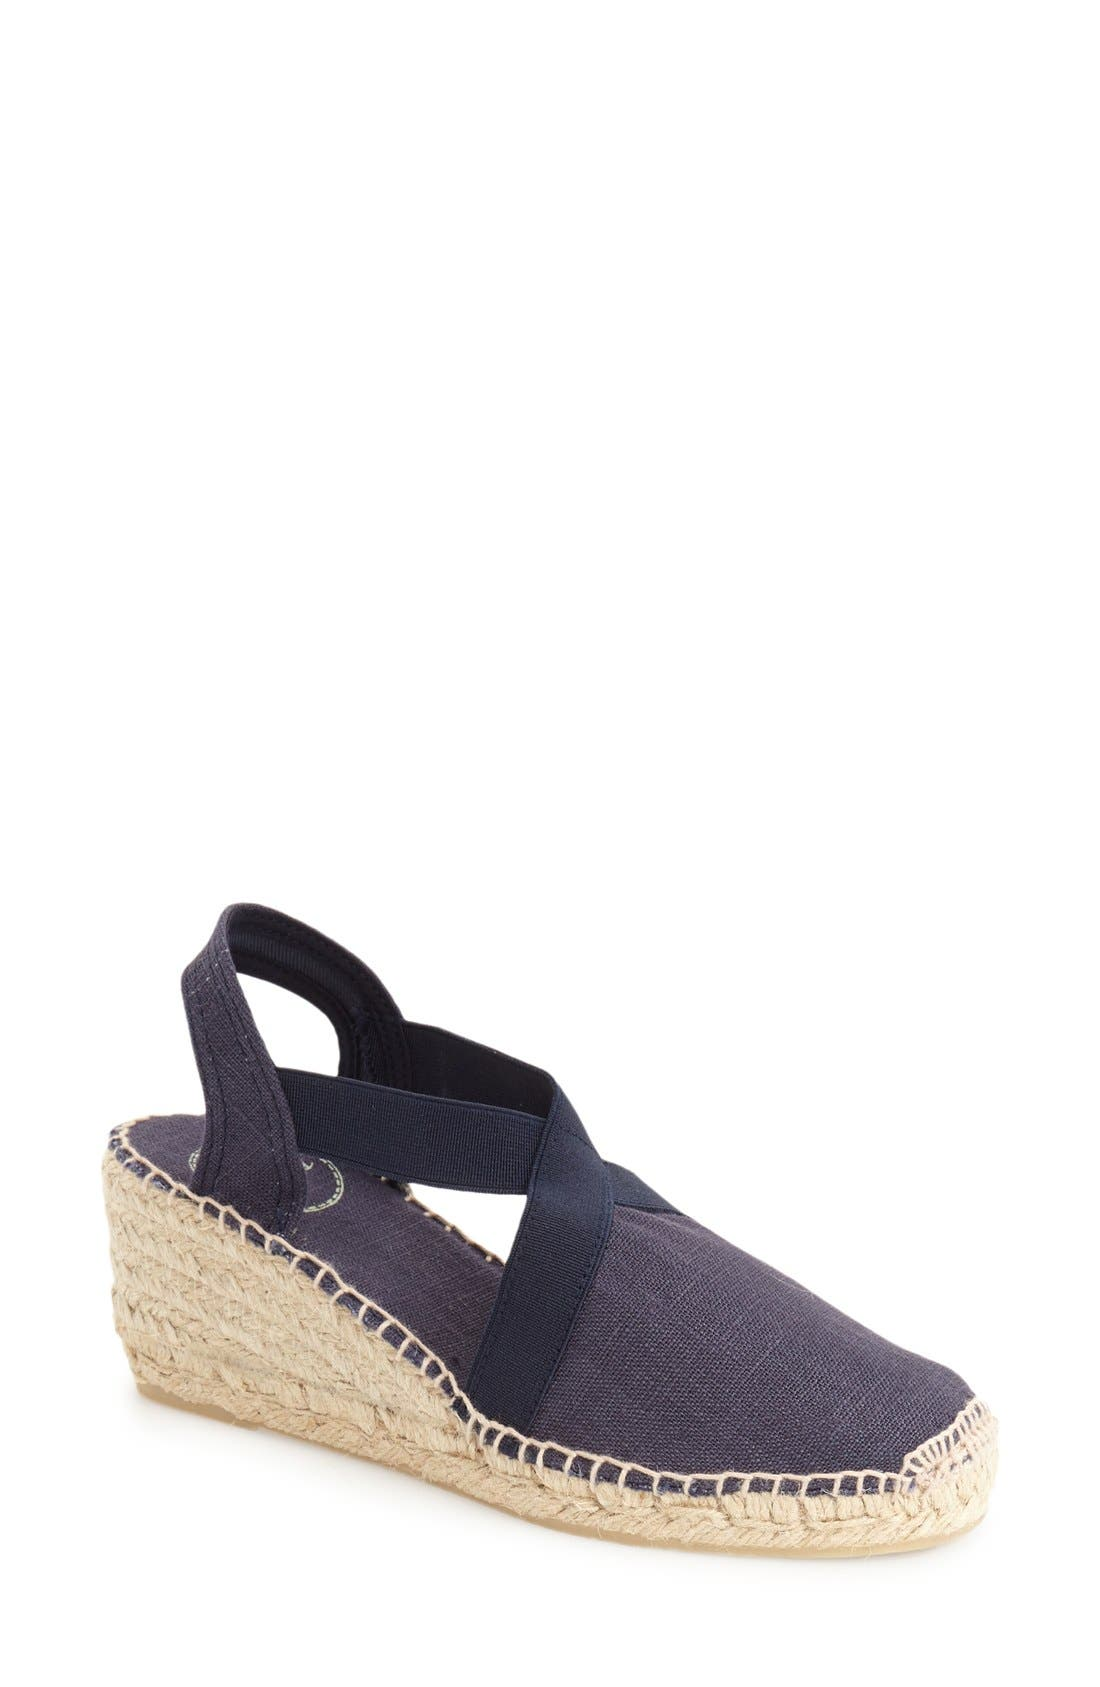 'Ter' Slingback Espadrille Sandal,                         Main,                         color, NAVY LINEN